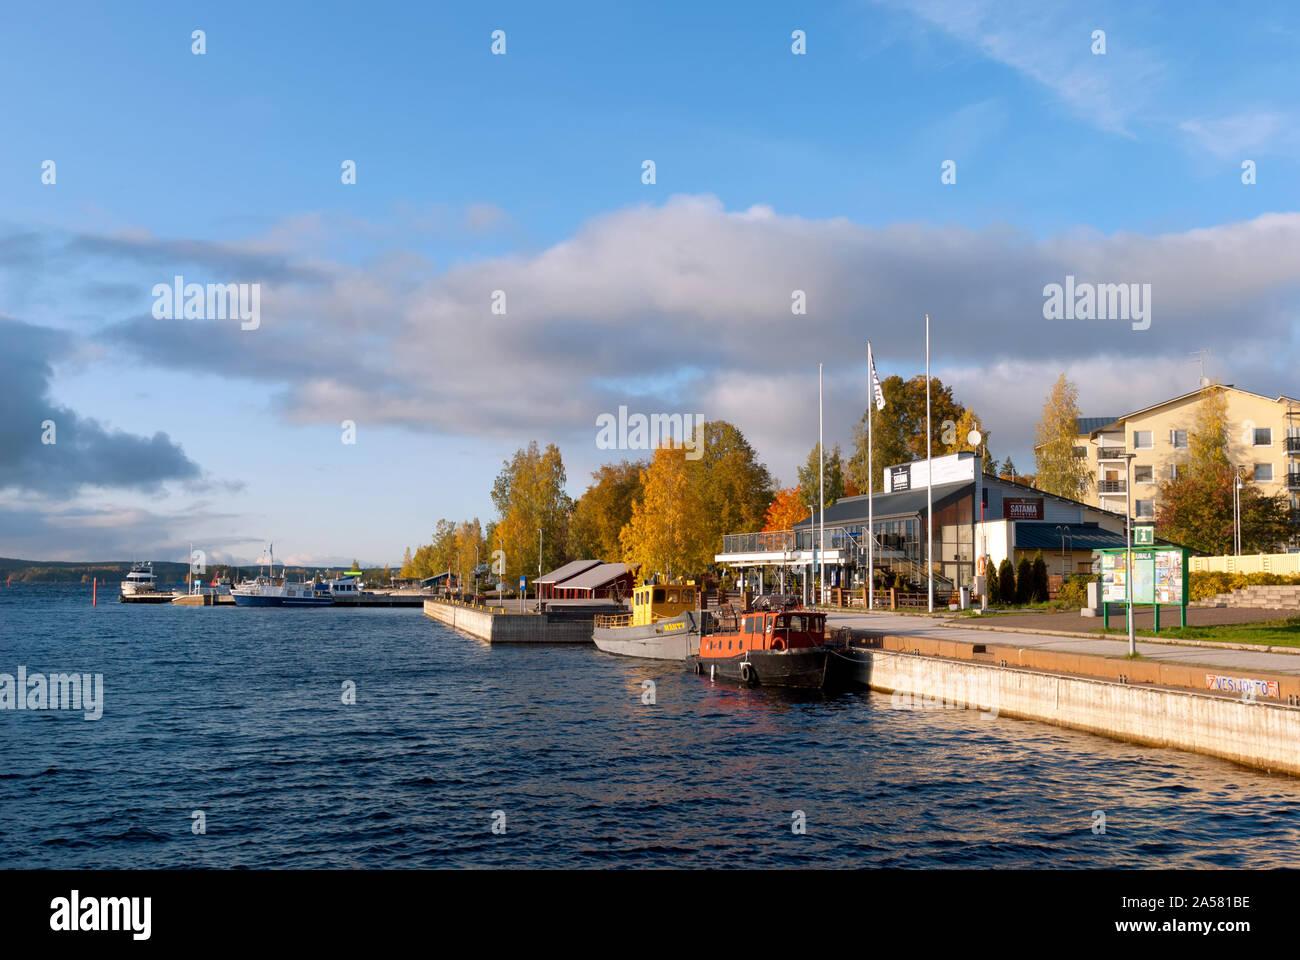 Puumala, Finland–October 5, 2019: Boats on the bank of The Saimaa Lake and residential buildings. Puumala Municipality. Southern Savonia (Savo) Region Stock Photo